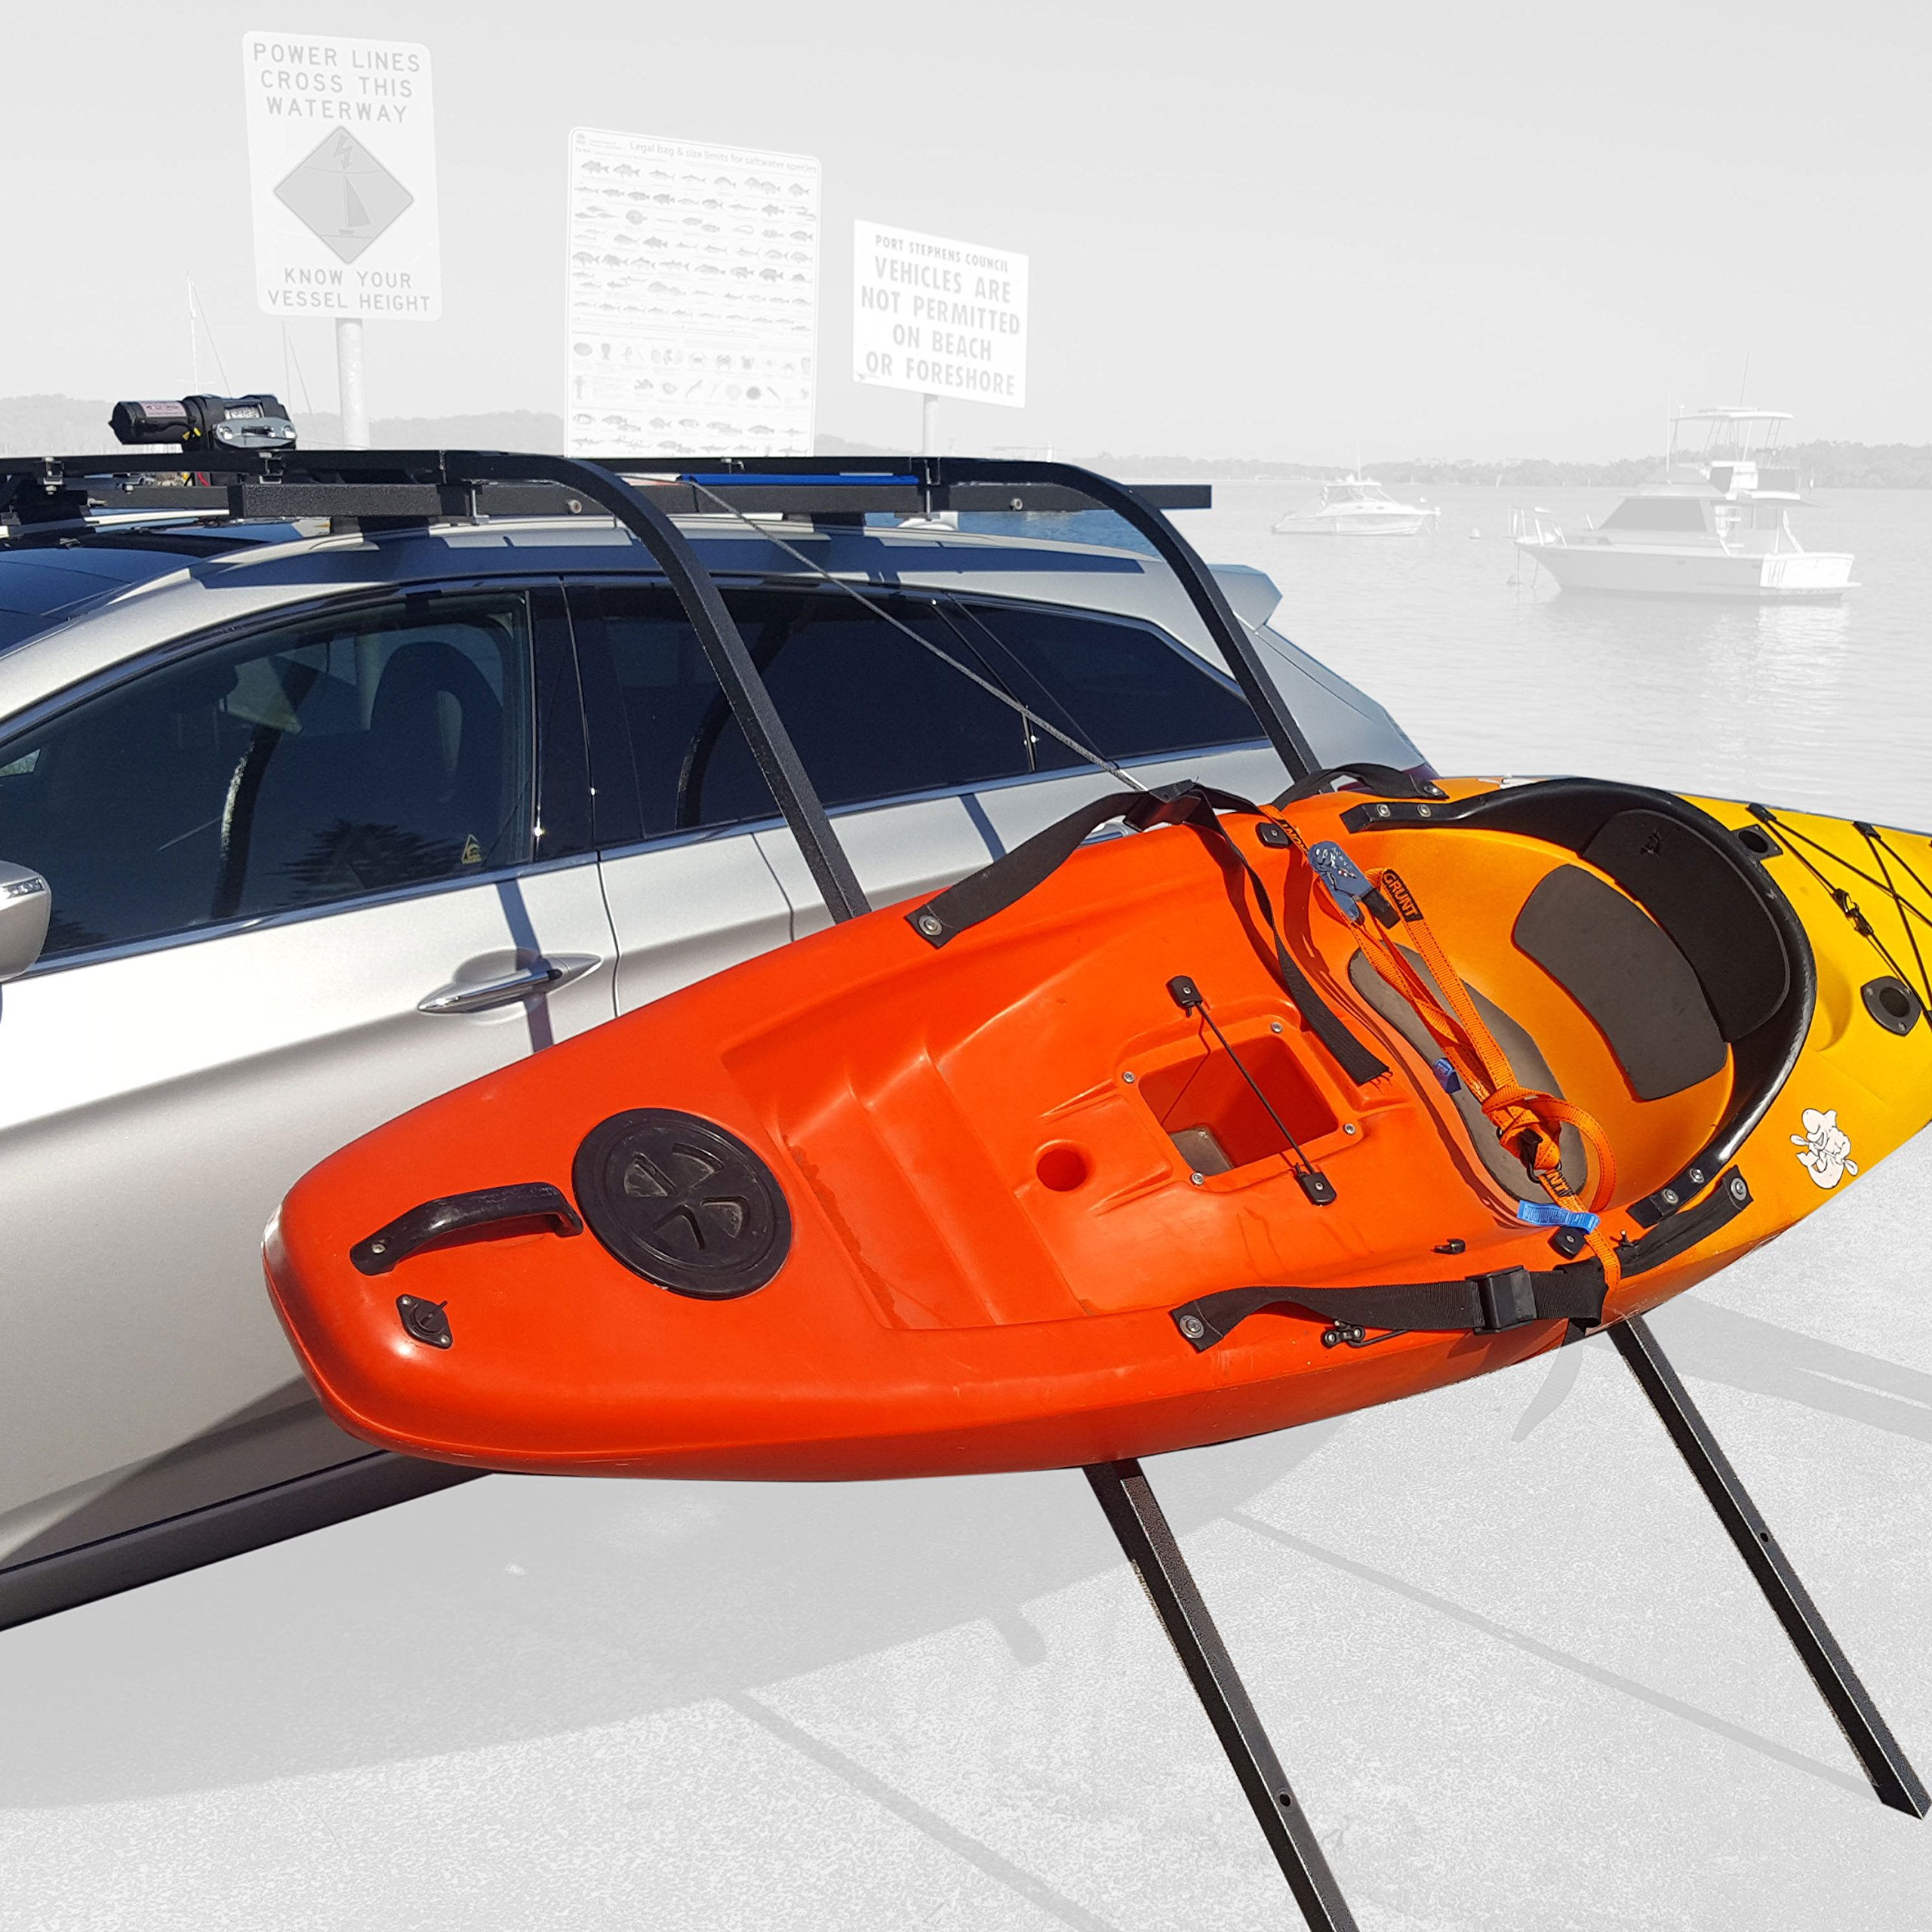 Sidewinder Kayak Loader, Winch, Remote Control Lift System